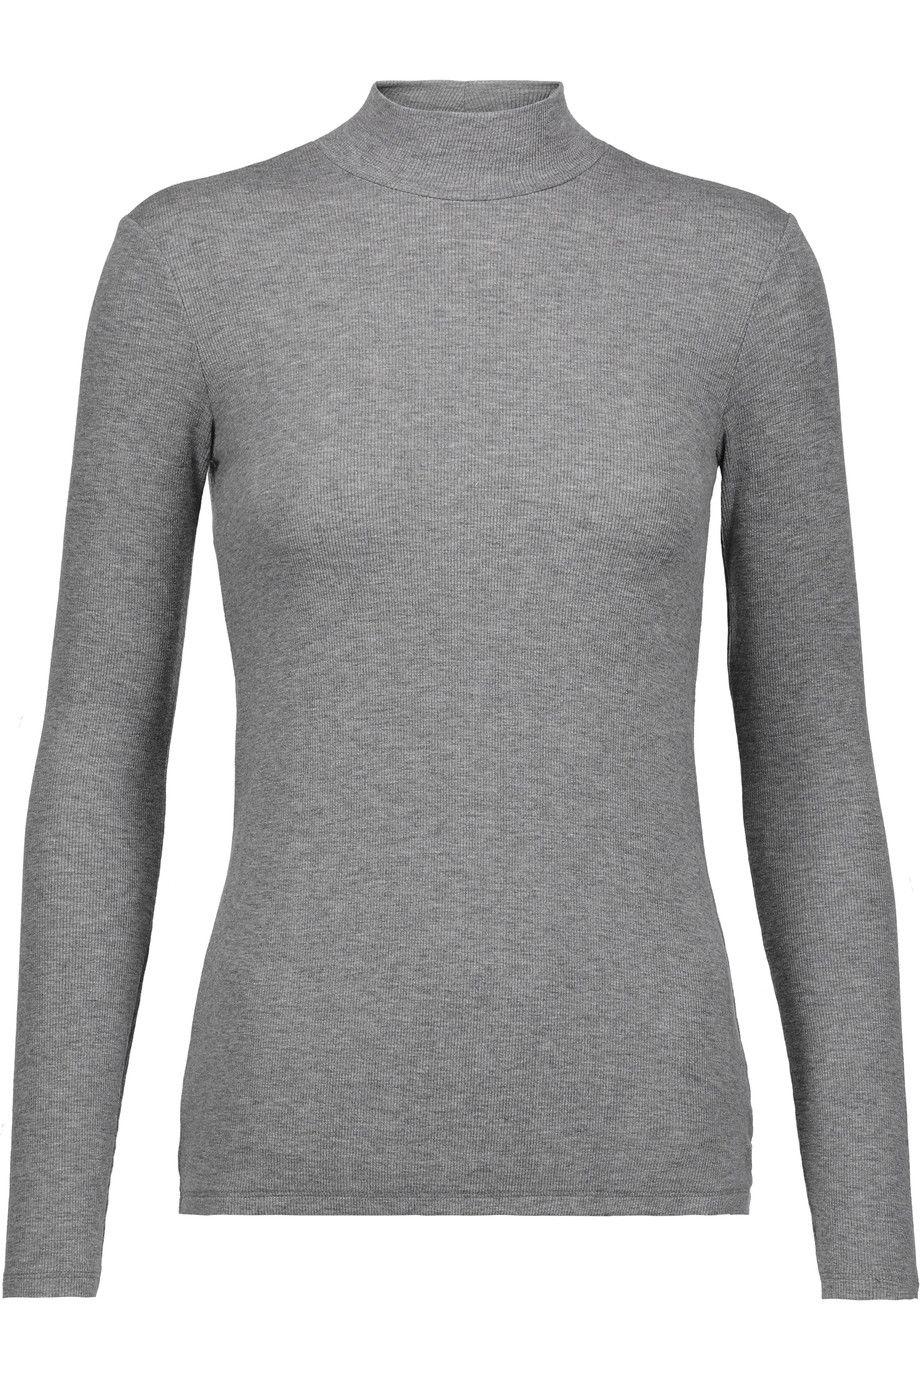 ATM ANTHONY THOMAS MELILLO Ribbed Stretch-Micro Modal Turtleneck Top.  #atmanthonythomasmelillo #cloth